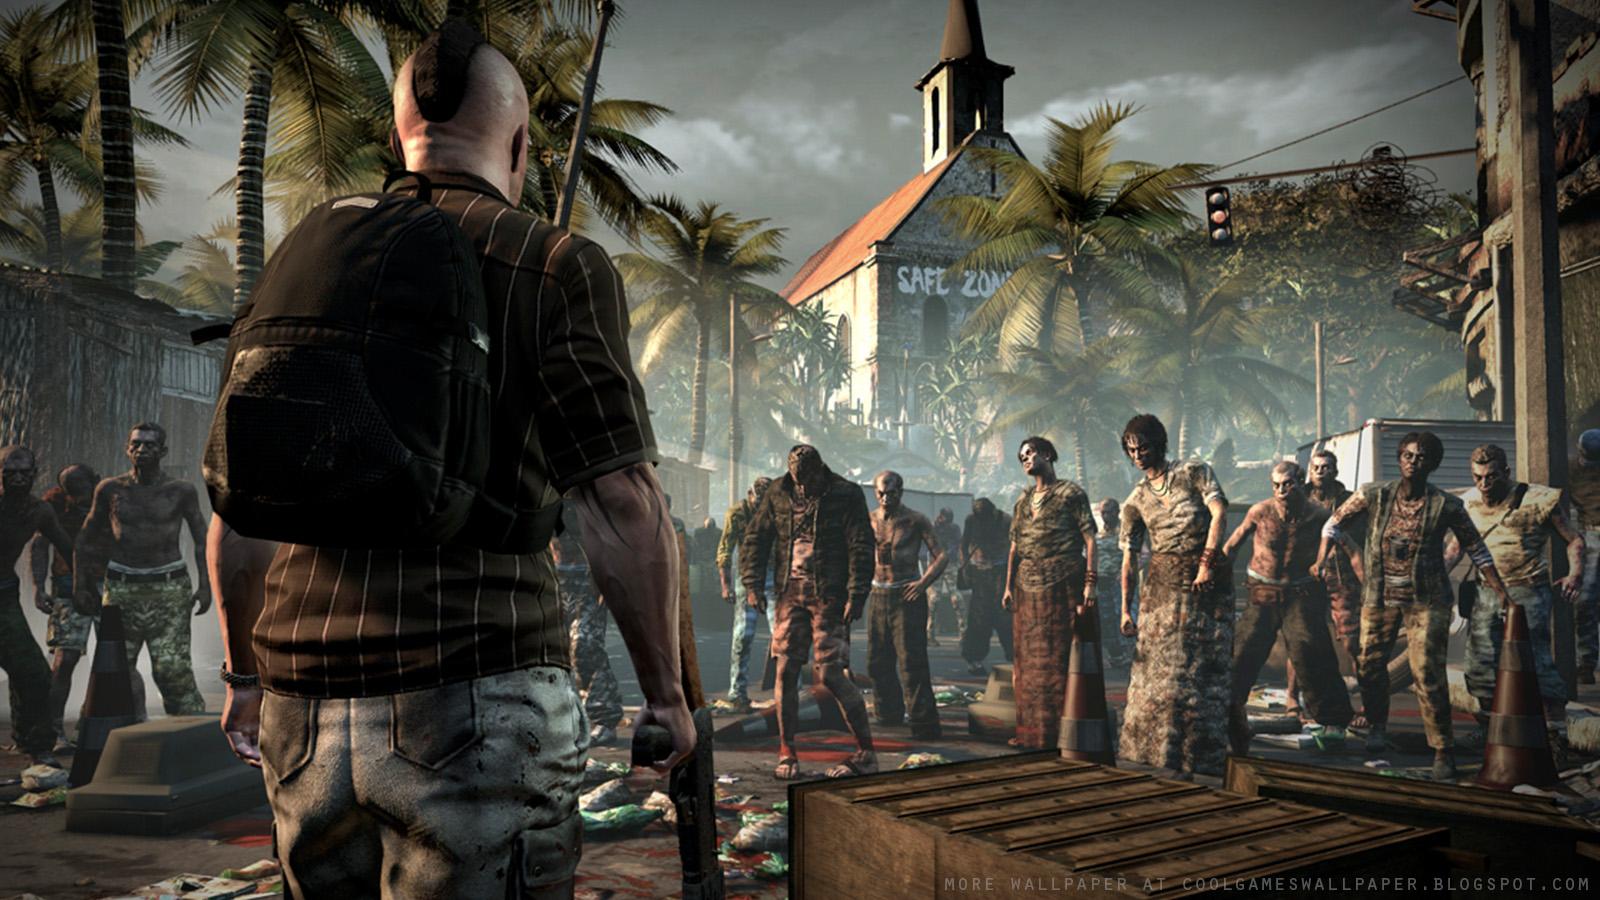 dead island desktop wallpaper - cool games wallpaper